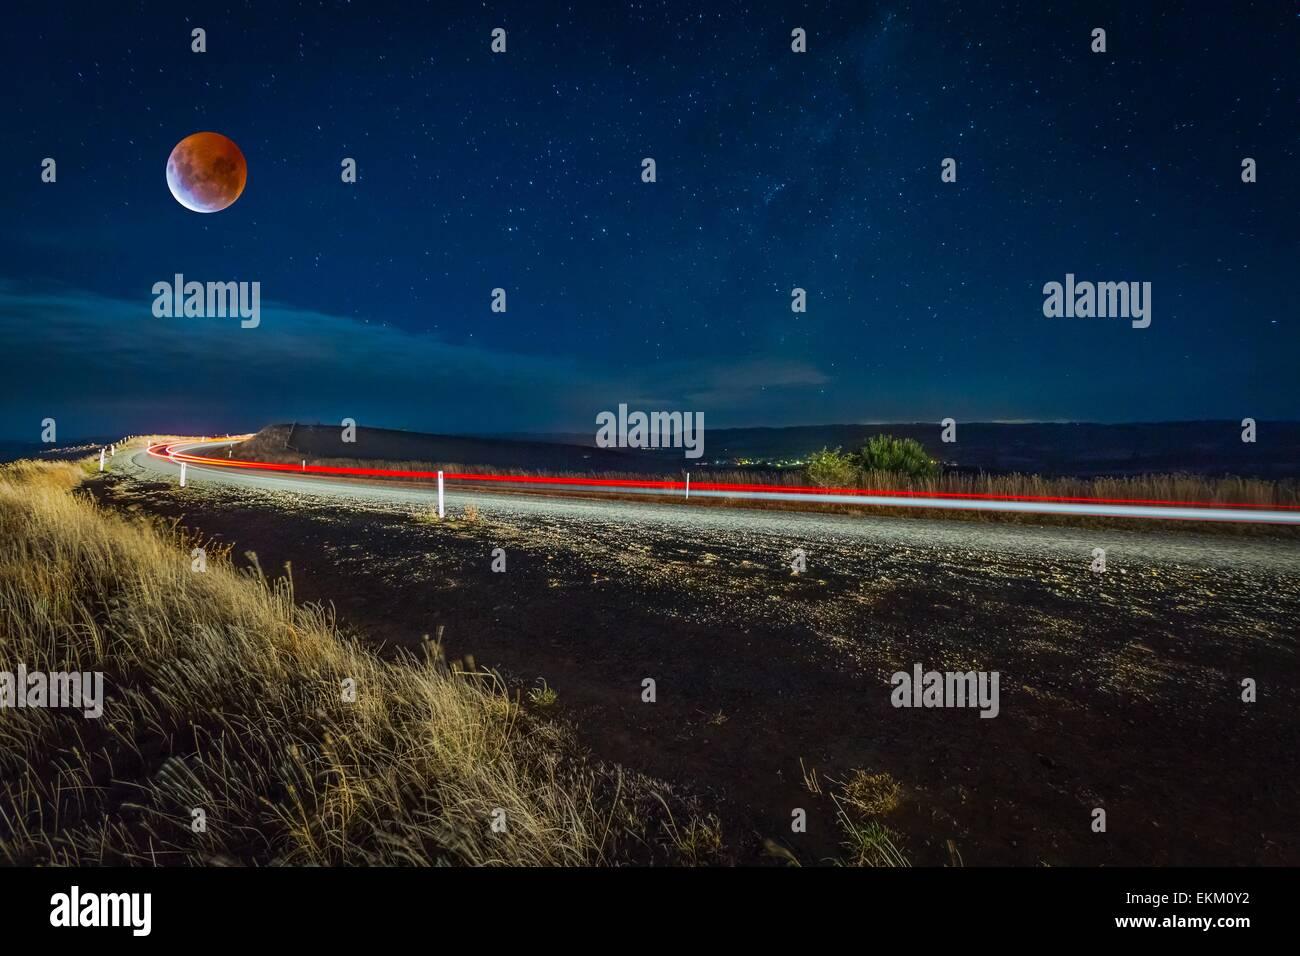 Lunar Eclipse - Australia, 2015 Stock Photo